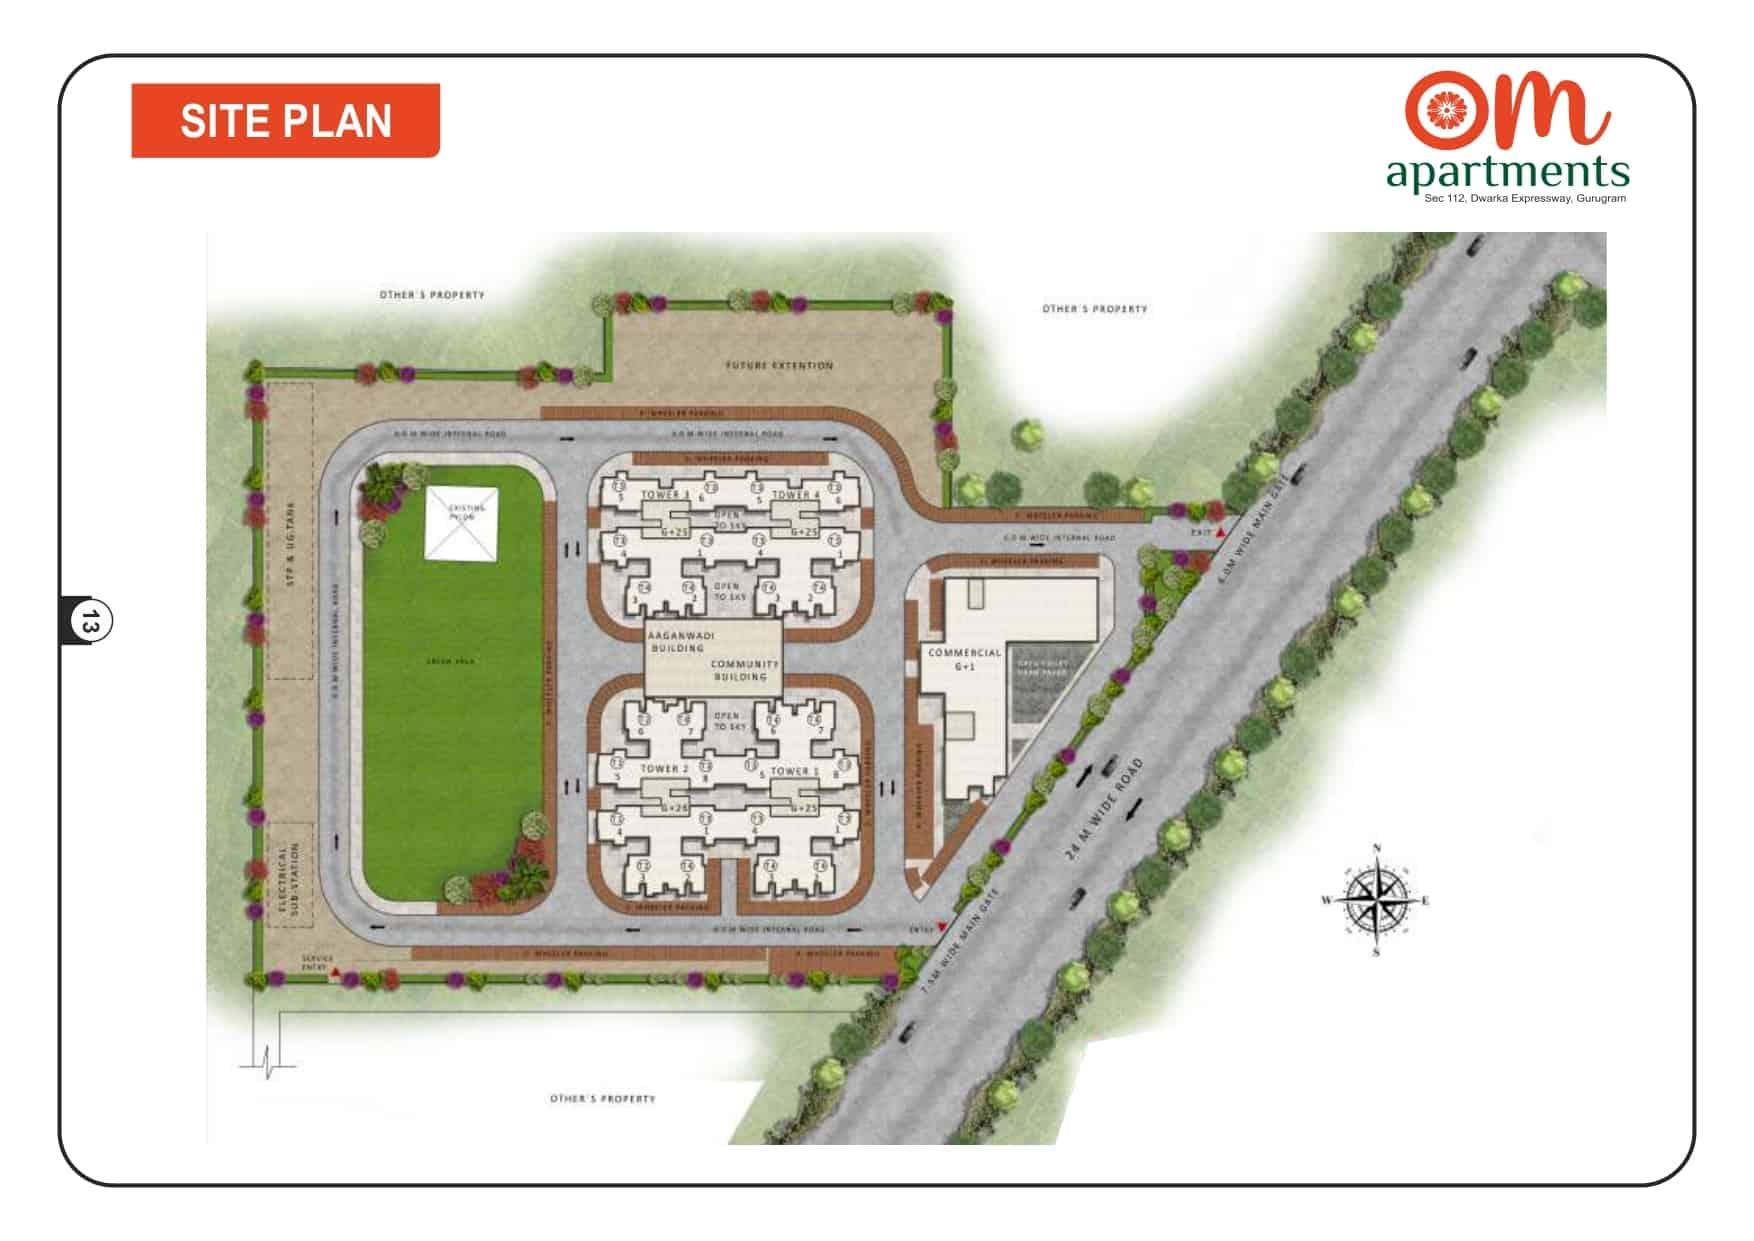 Site Plan Pareena Om Apartments 112